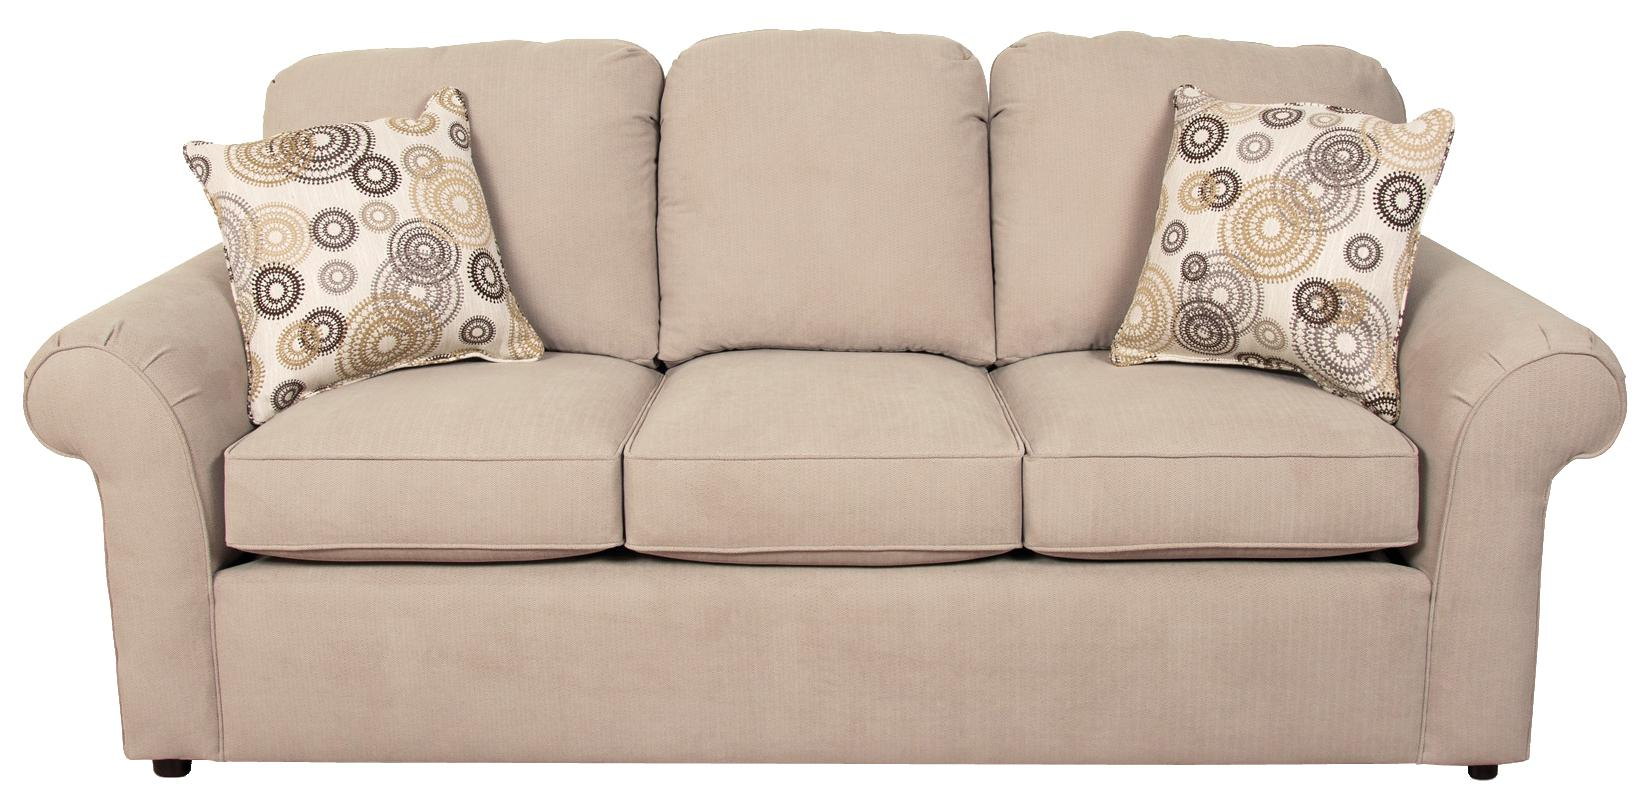 Malibu Sleeper Sofa by England at Suburban Furniture